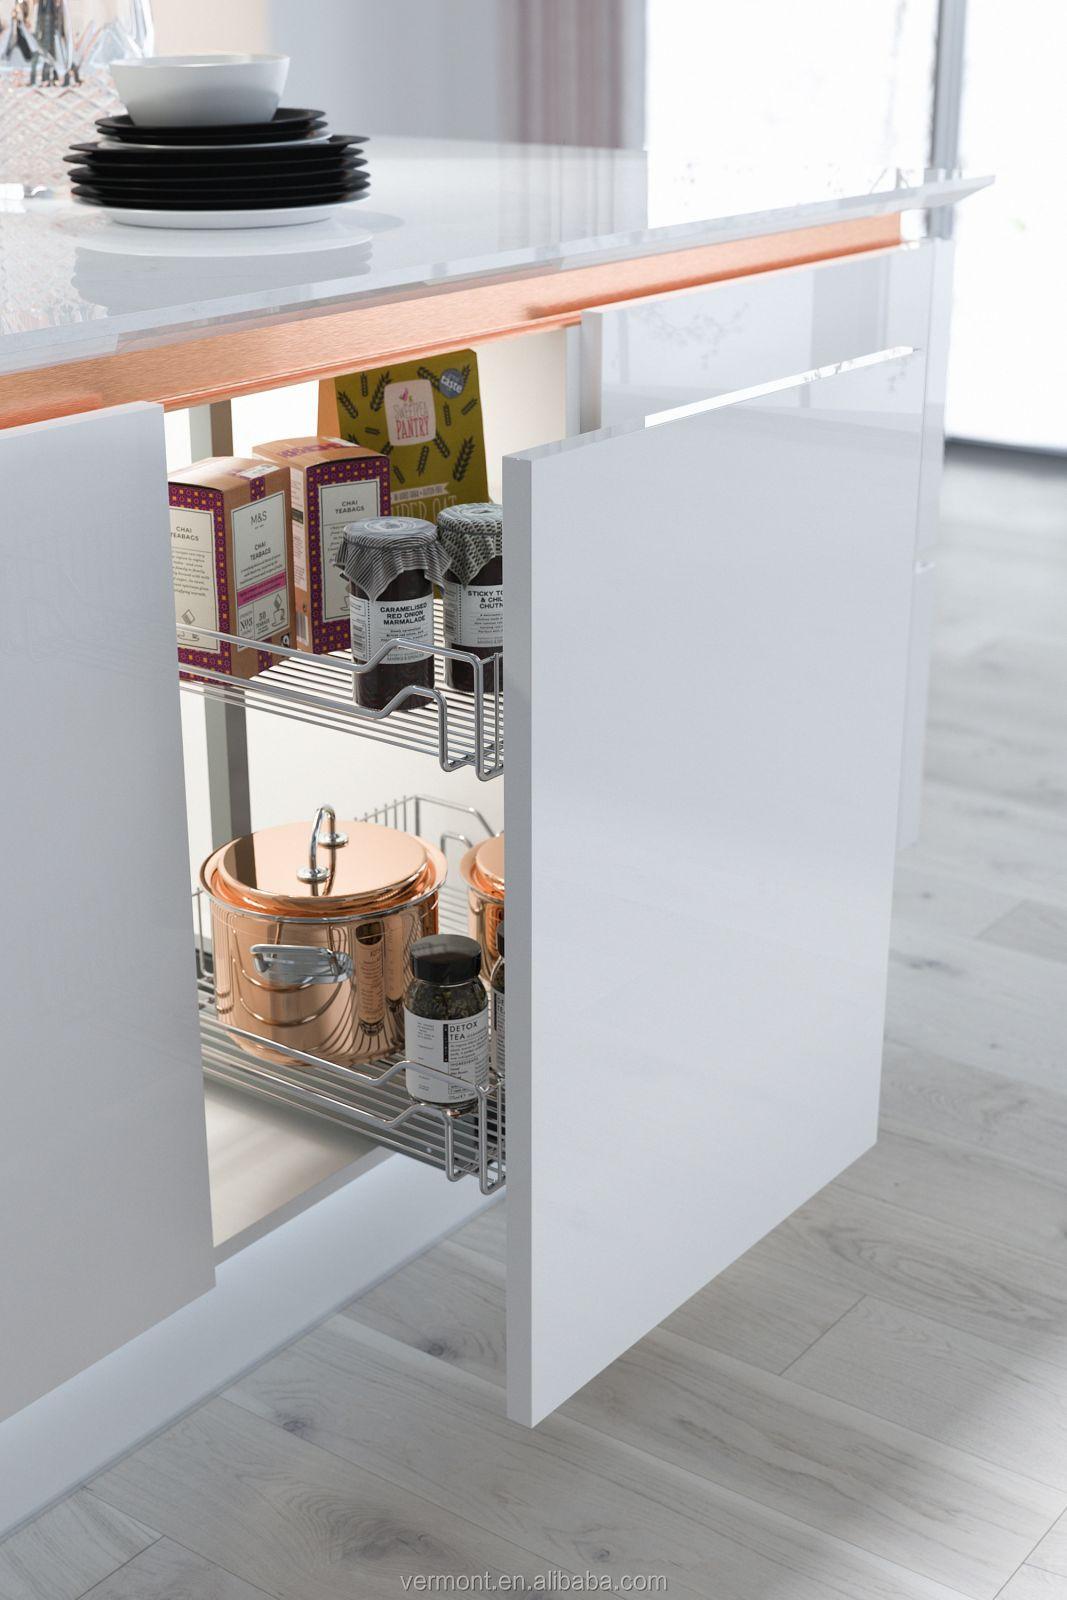 colorful kitchen cabinets corner table with bench 2018 红色多彩现代厨柜 酒店厨房家具 定制厨房 buy 厨柜 现代厨房